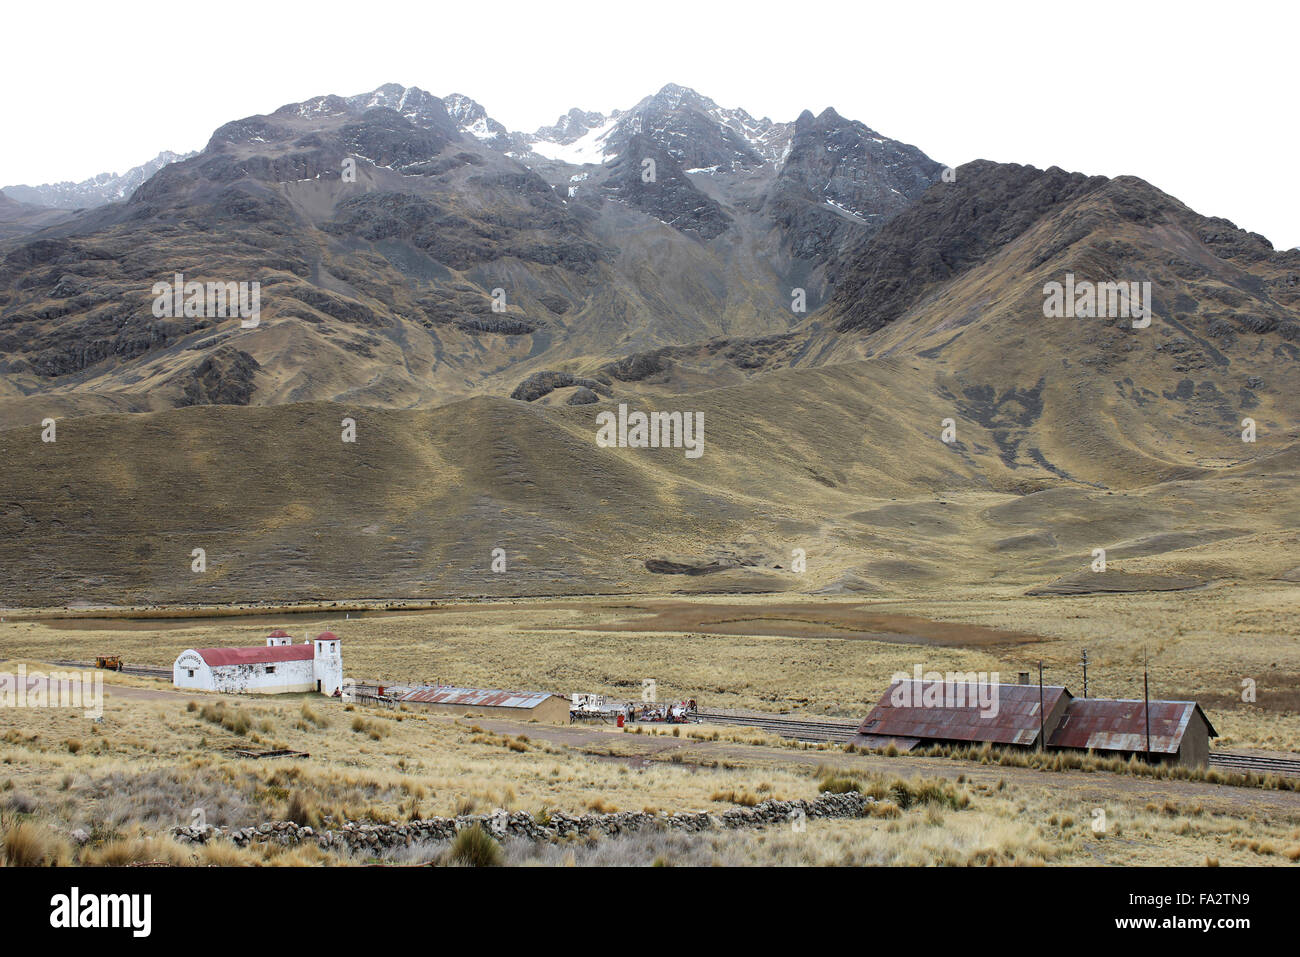 Abra La Raya, High Altitude Railway Pass between Puno and Cuzco, Peru - Stock Image